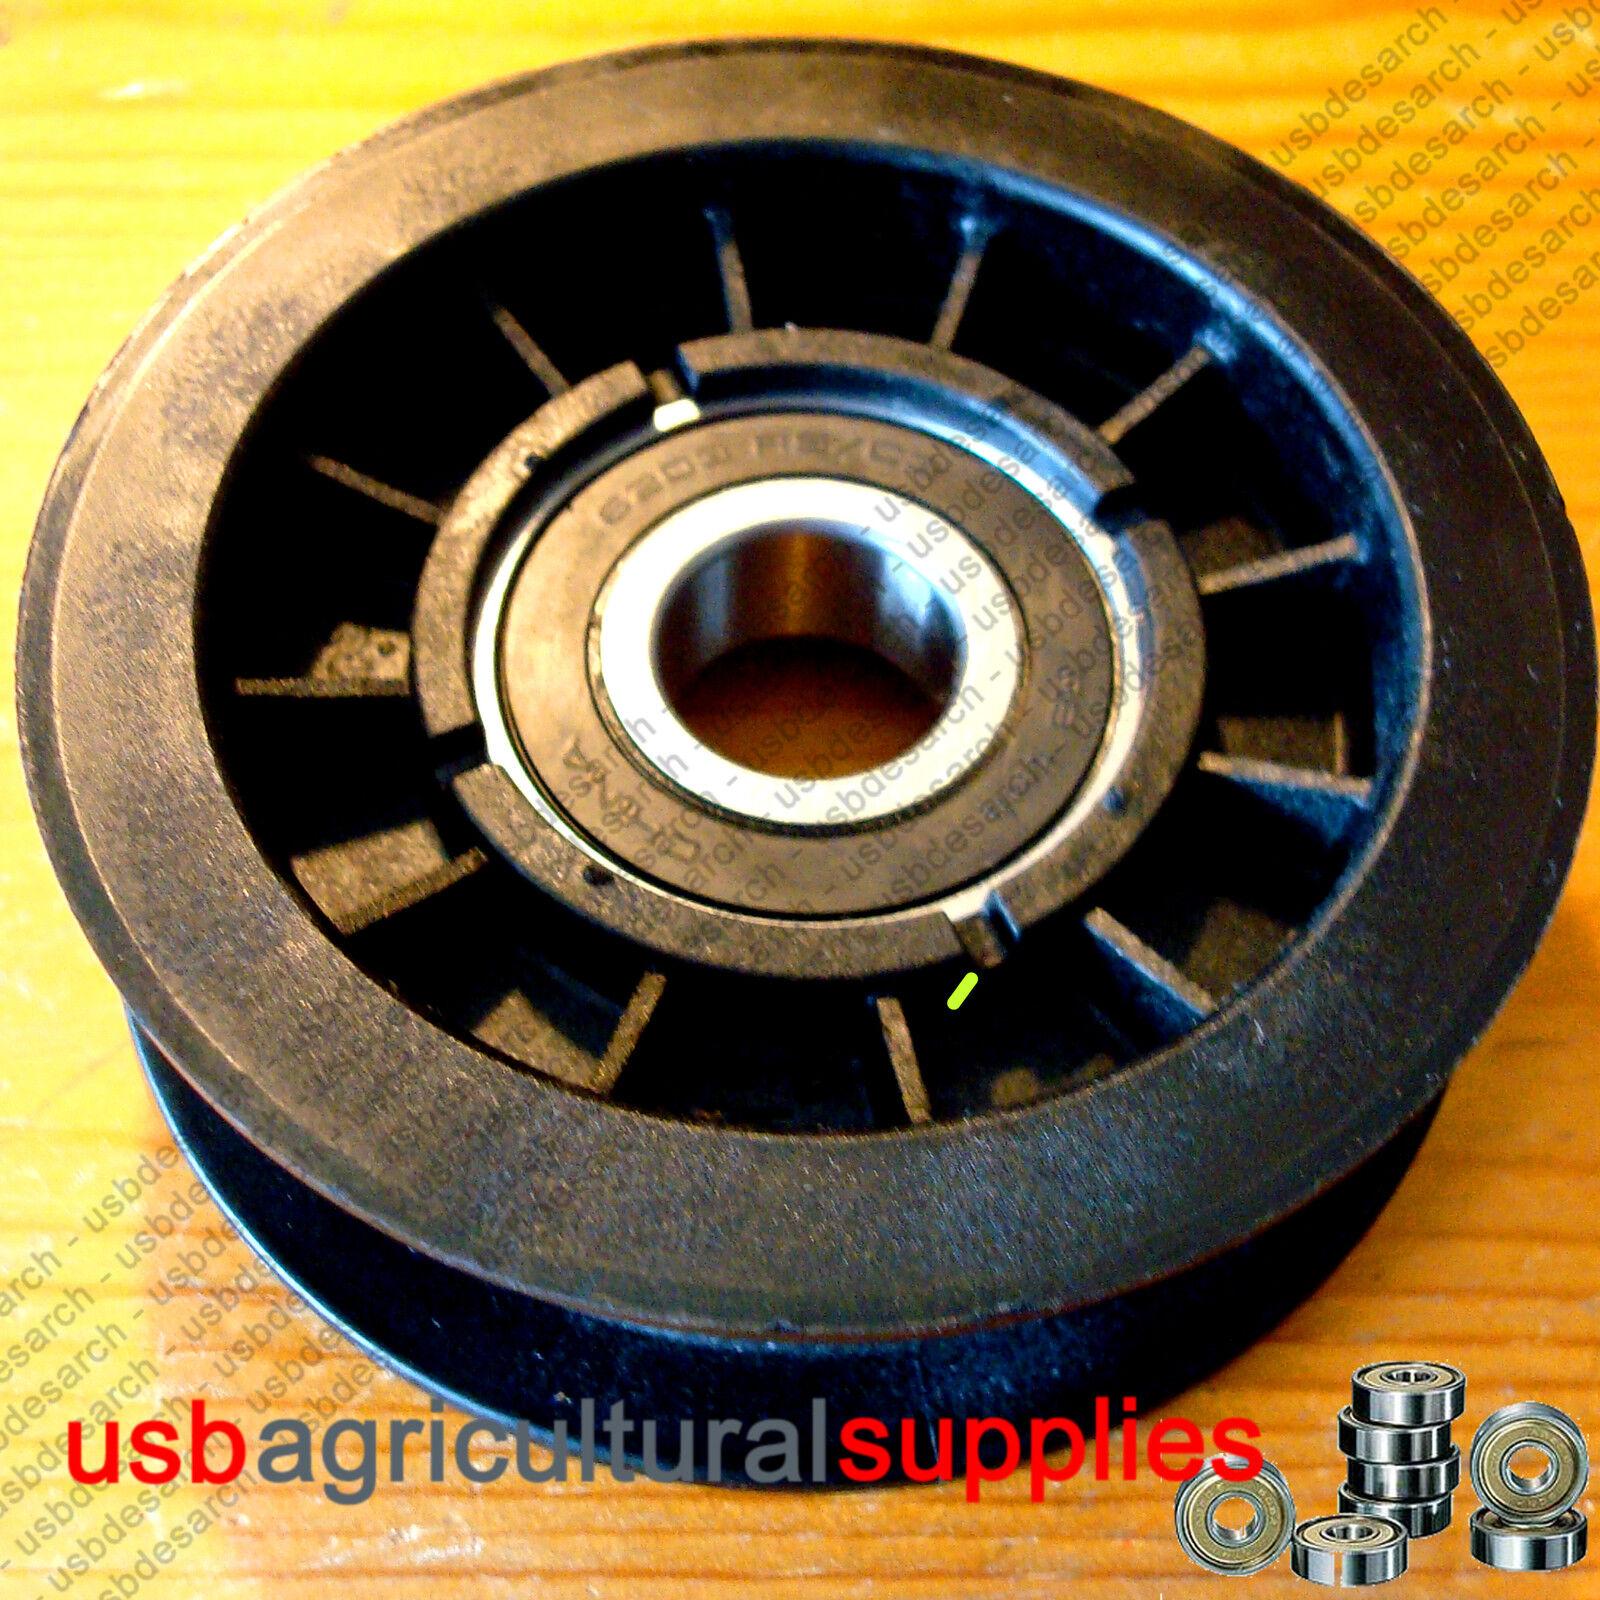 4x Polea   Jockey   Idler Wheel Hayter 690409 John Deere Nexy día del